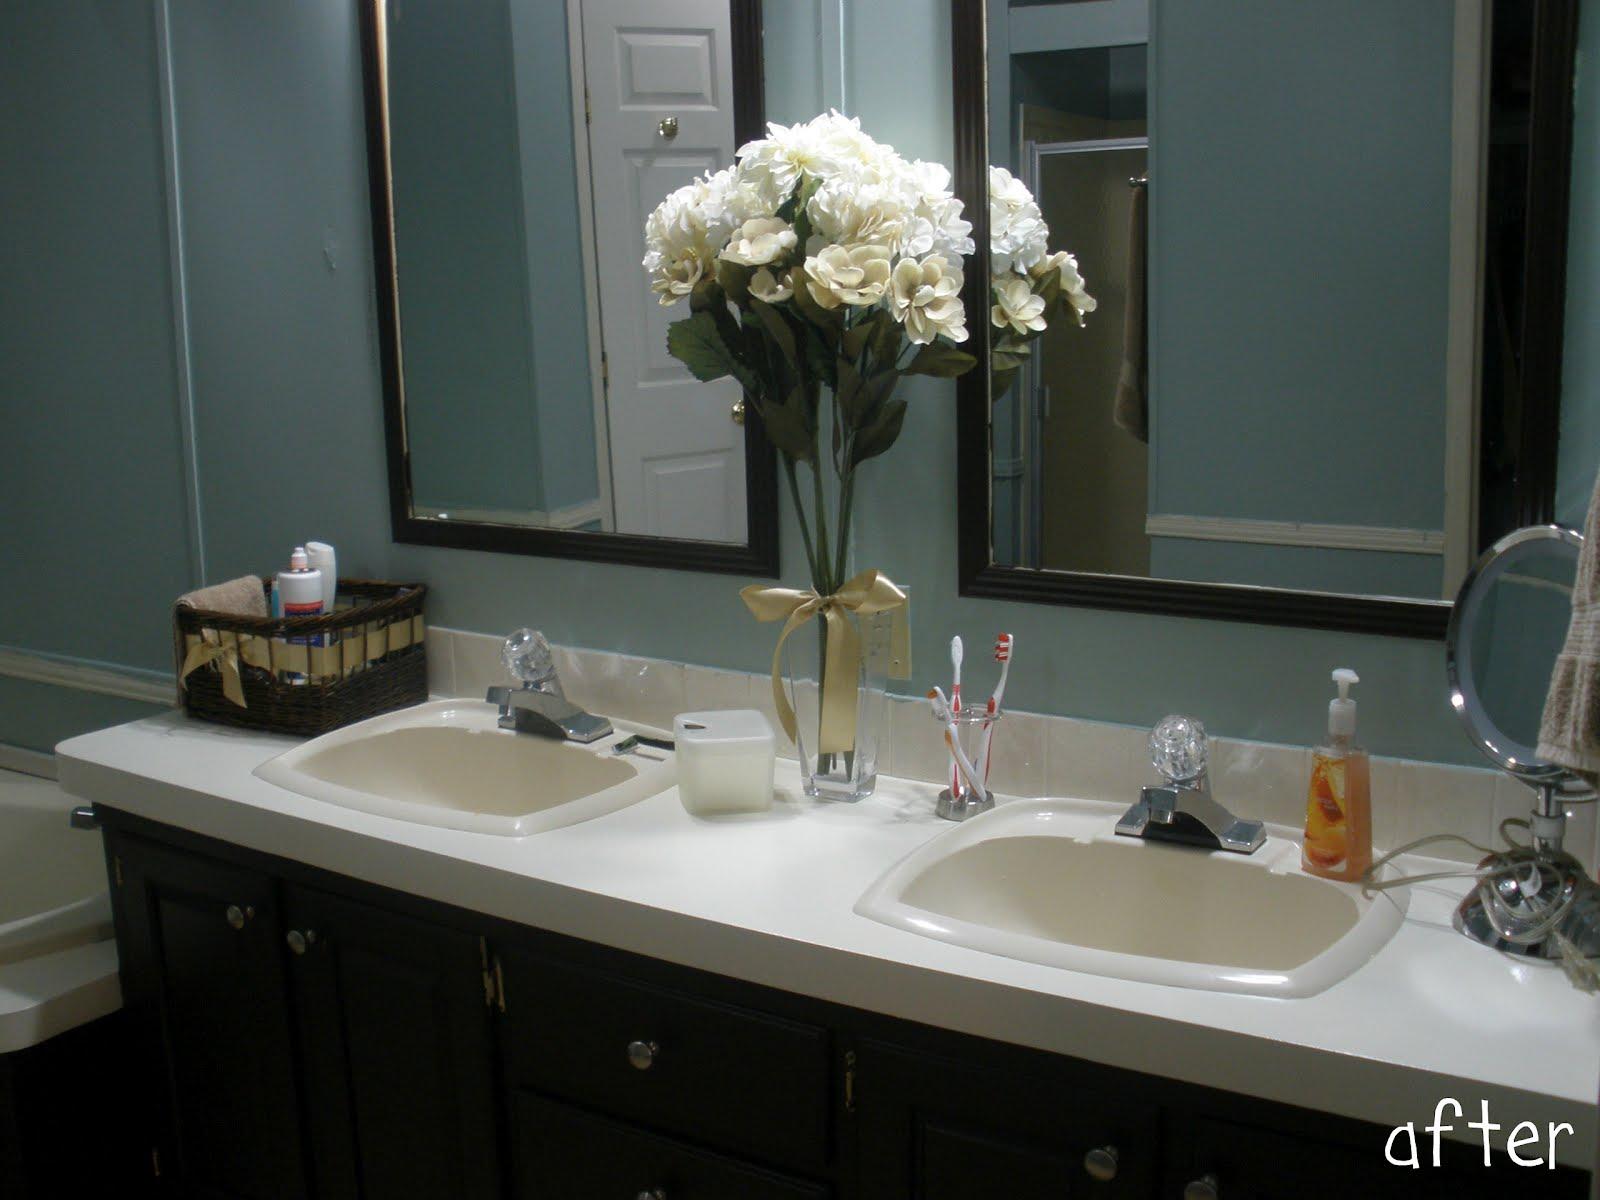 http://4.bp.blogspot.com/-GM1TFgHtRi8/T0WhIHaQFuI/AAAAAAAACwc/Jr_aKWyVmlA/s1600/master%2Bbathroom%2Bafter%2Ba.jpg